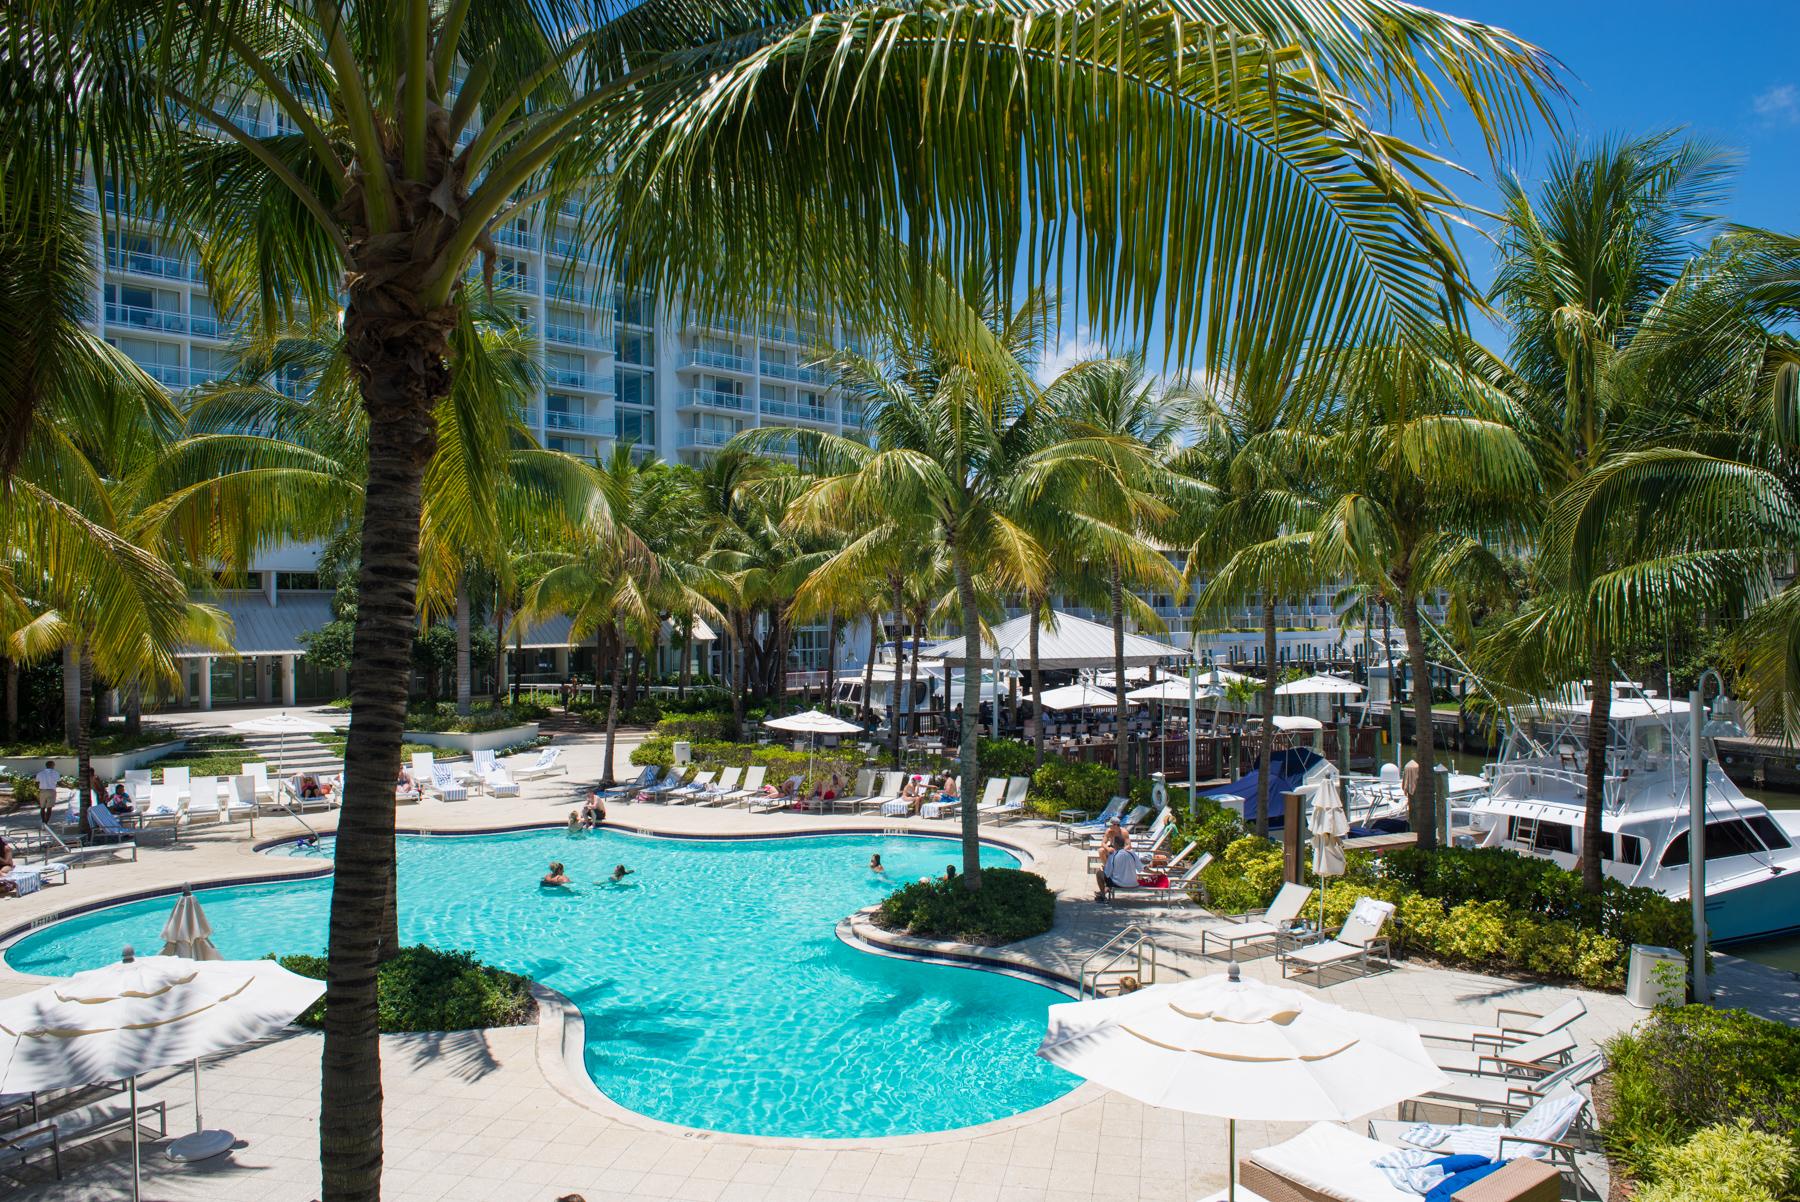 HILTON FORT LAUDERDALE MARINA   Fort Lauderdale, FL 33316